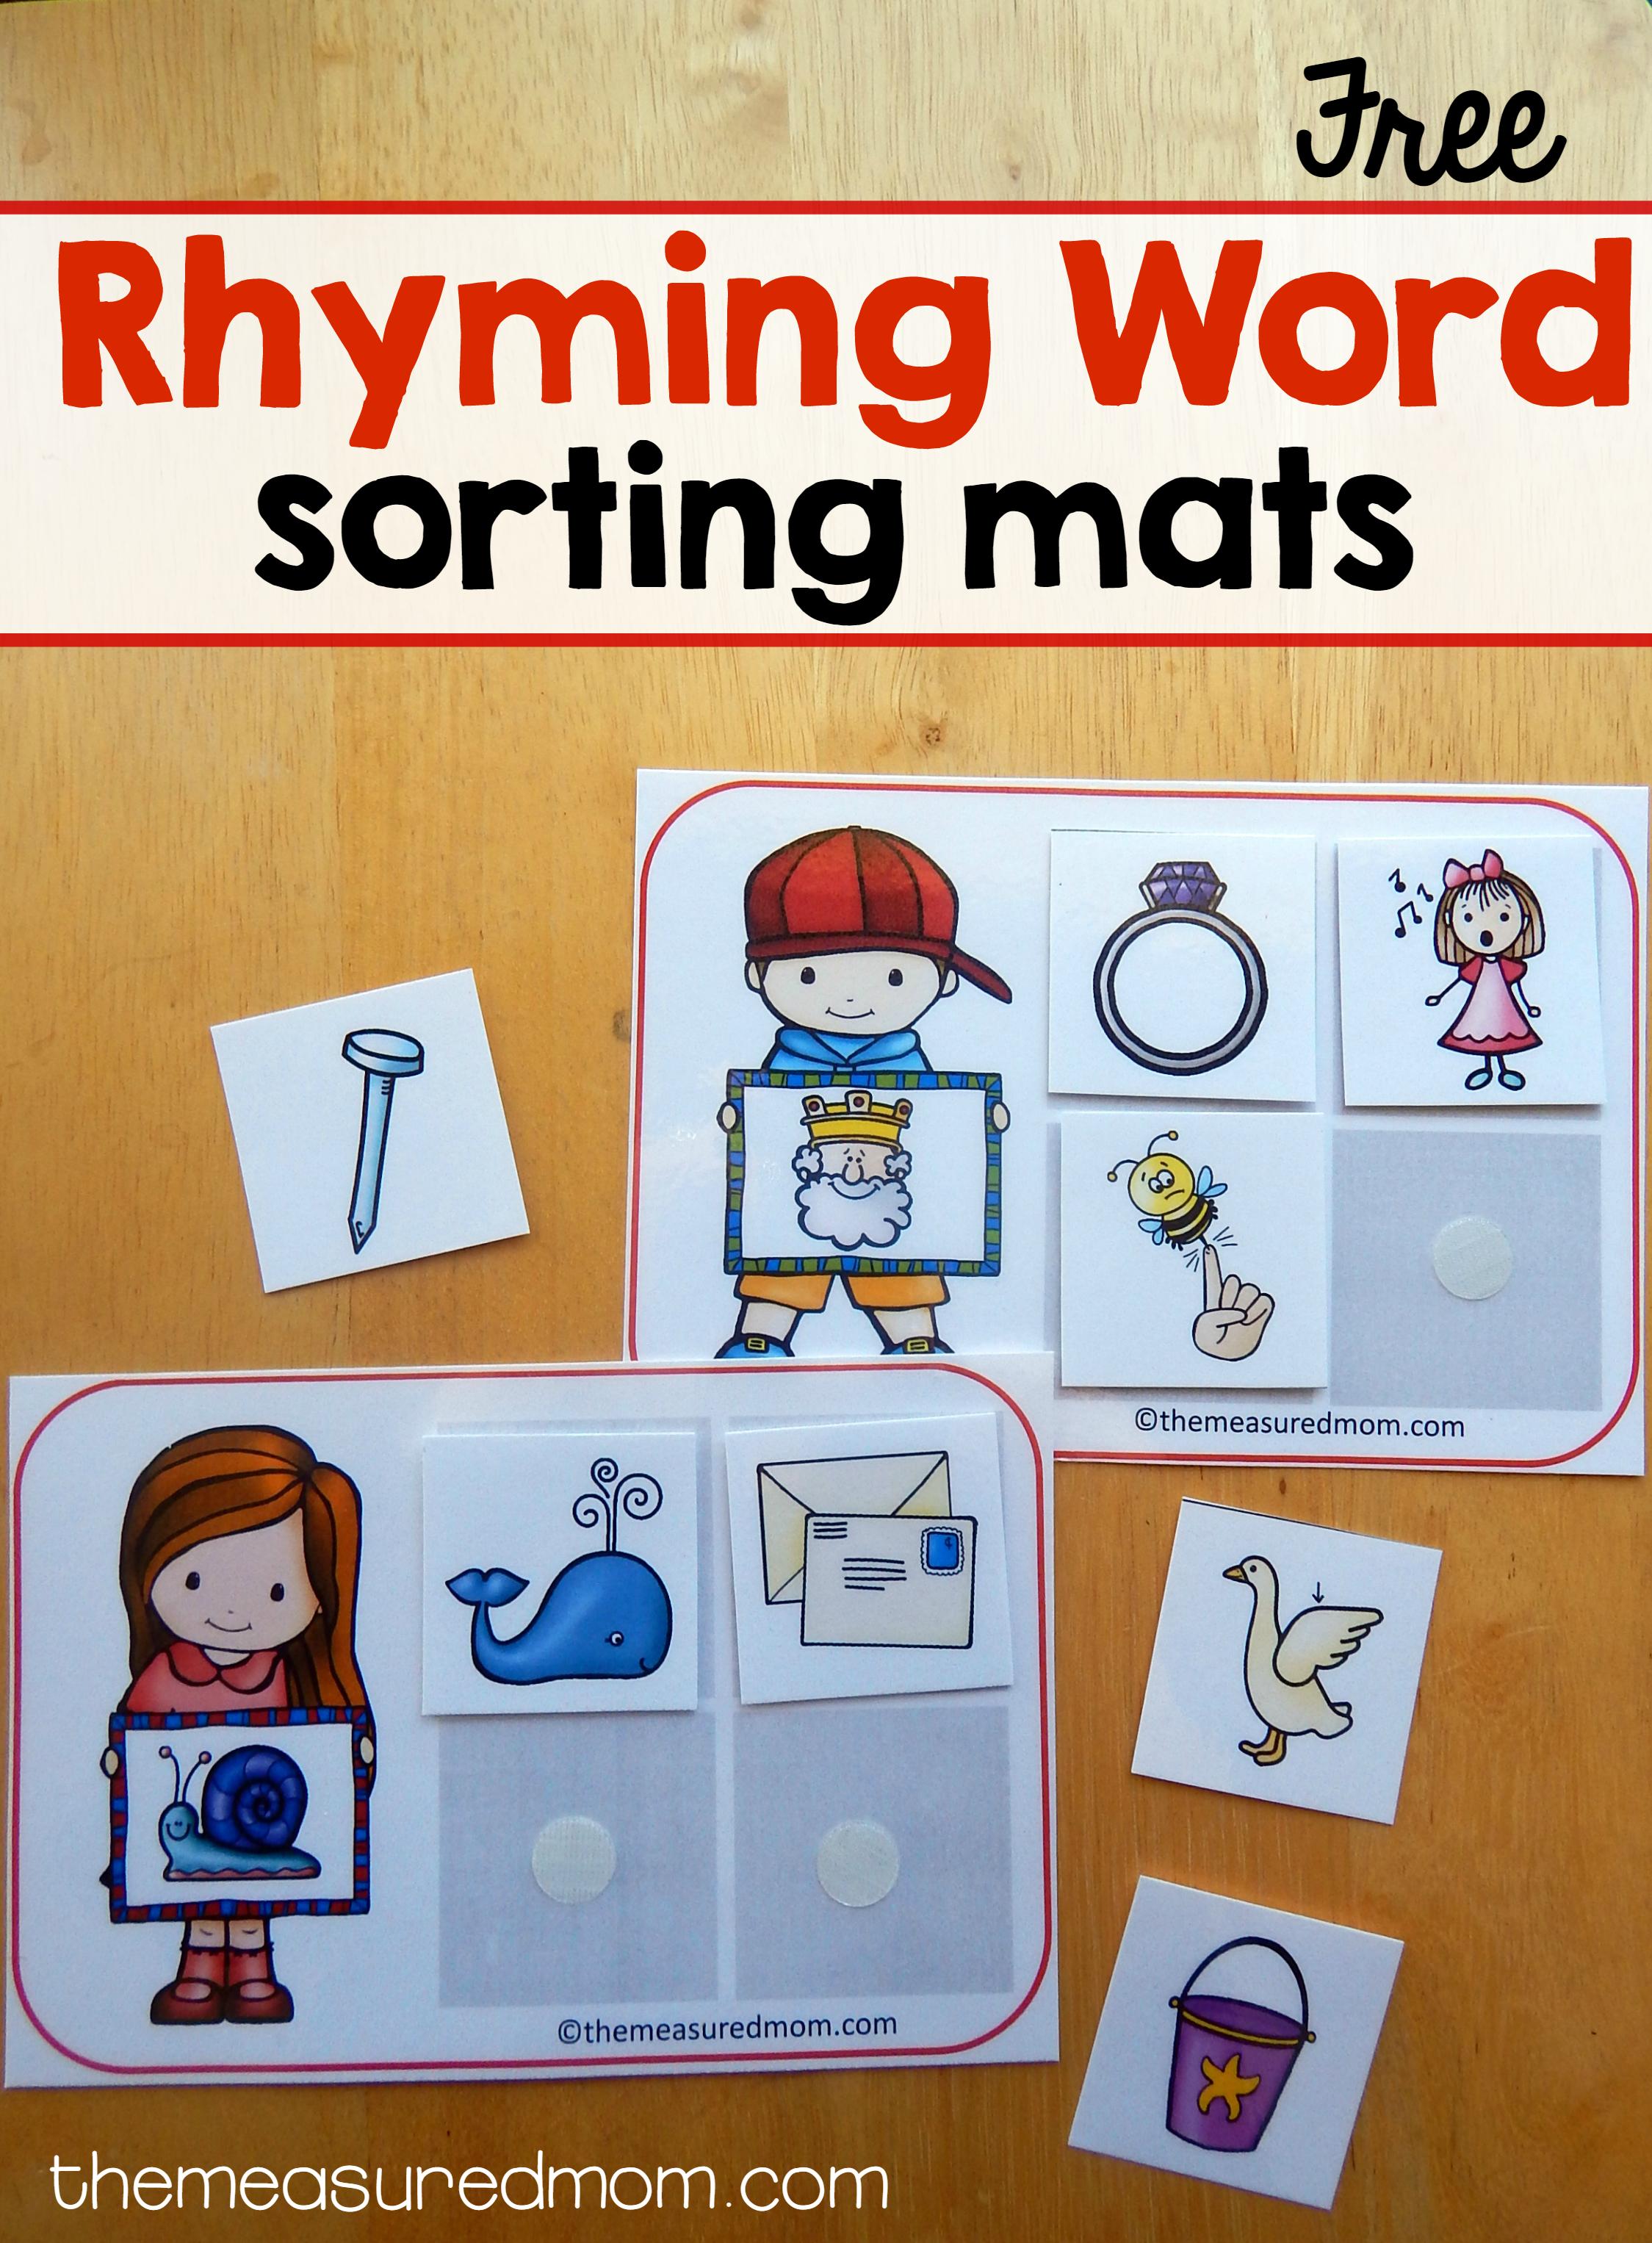 Free Printables - The Measured Mom - Free Printable Rhyming Words Flash Cards